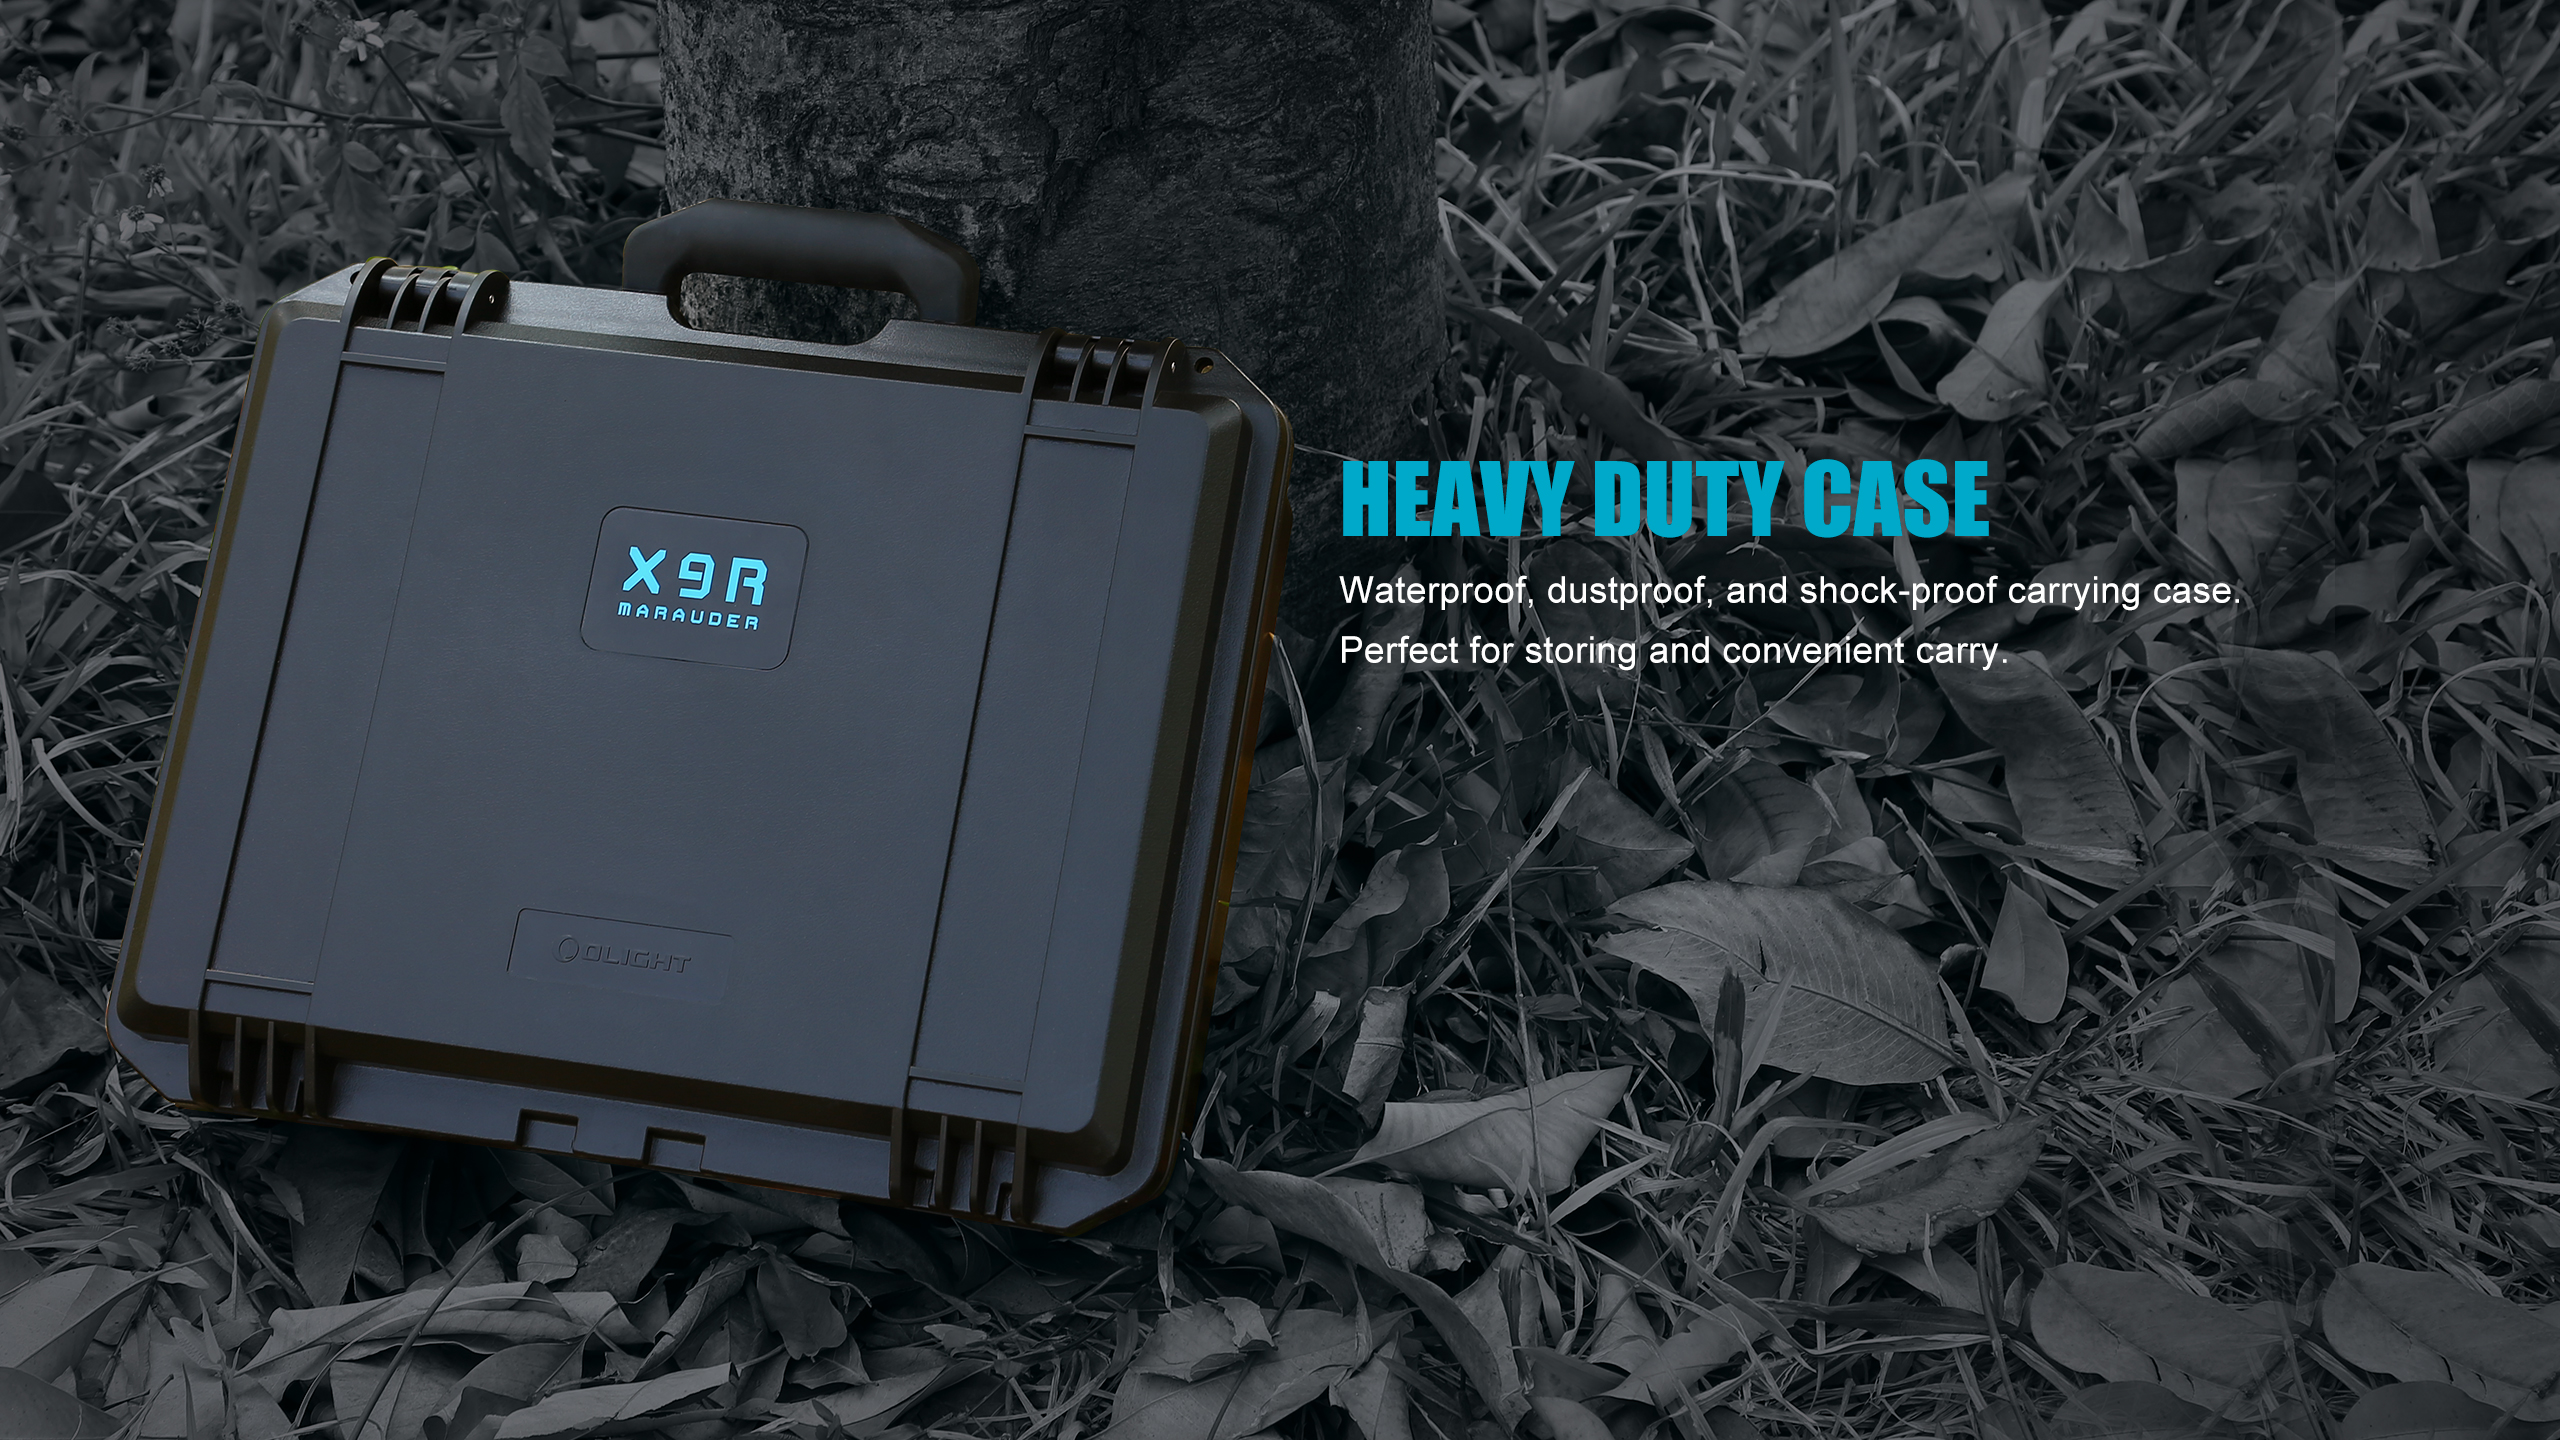 X9R Brightest Flashlight Case